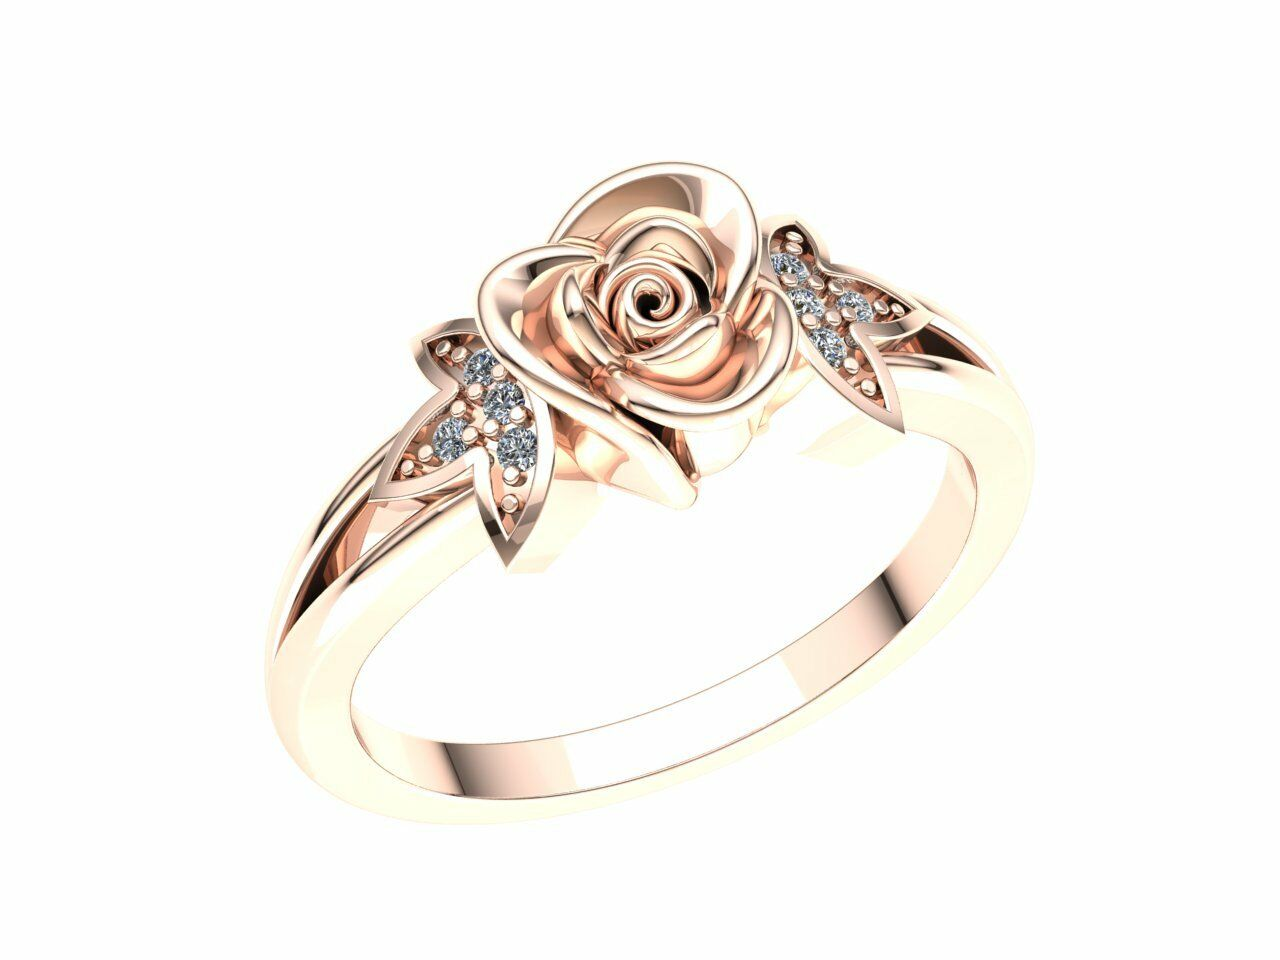 0.33carat Round Brilliant Cut Diamond Ladies Flower Fancy Promise Ring 10K gold